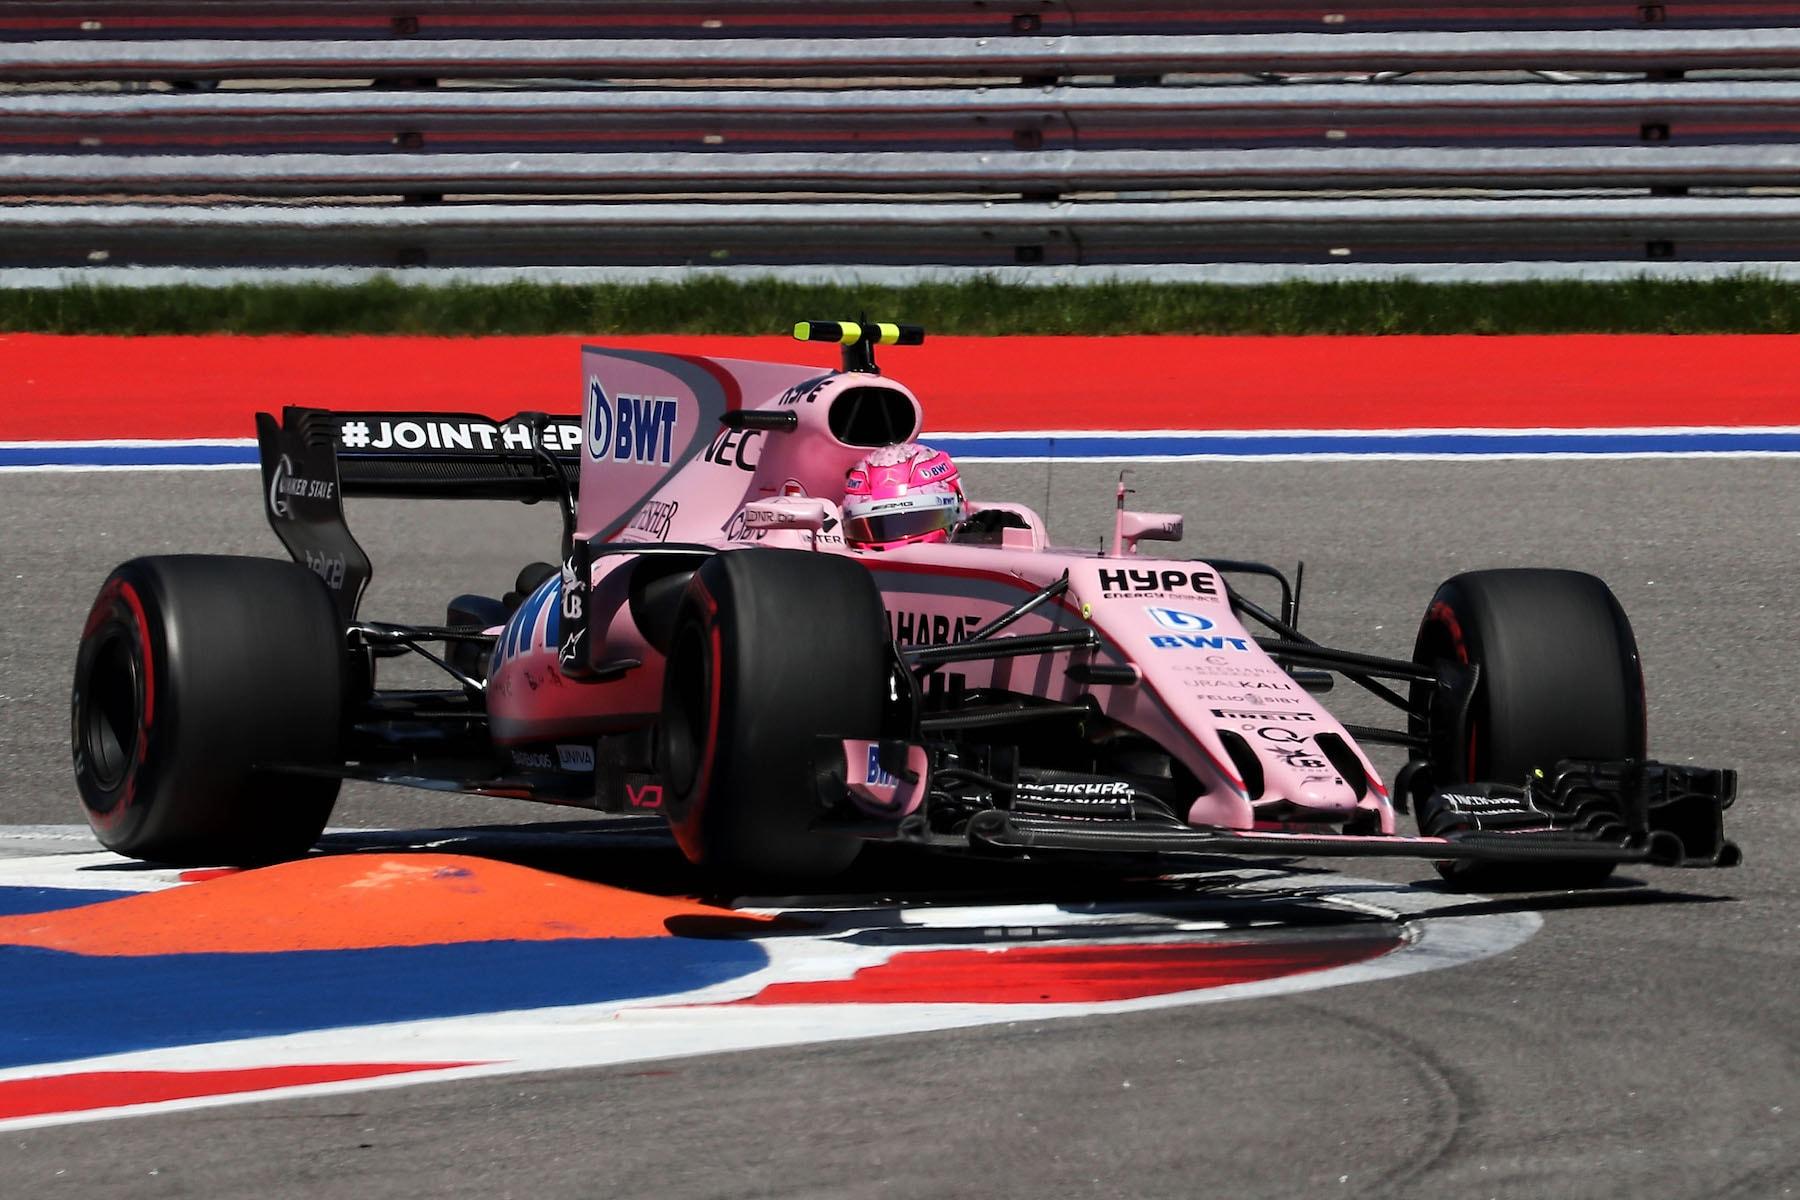 2017 Esteban Ocon | Force India VJM10 | 2017 Russian FP3 1 copy.jpg